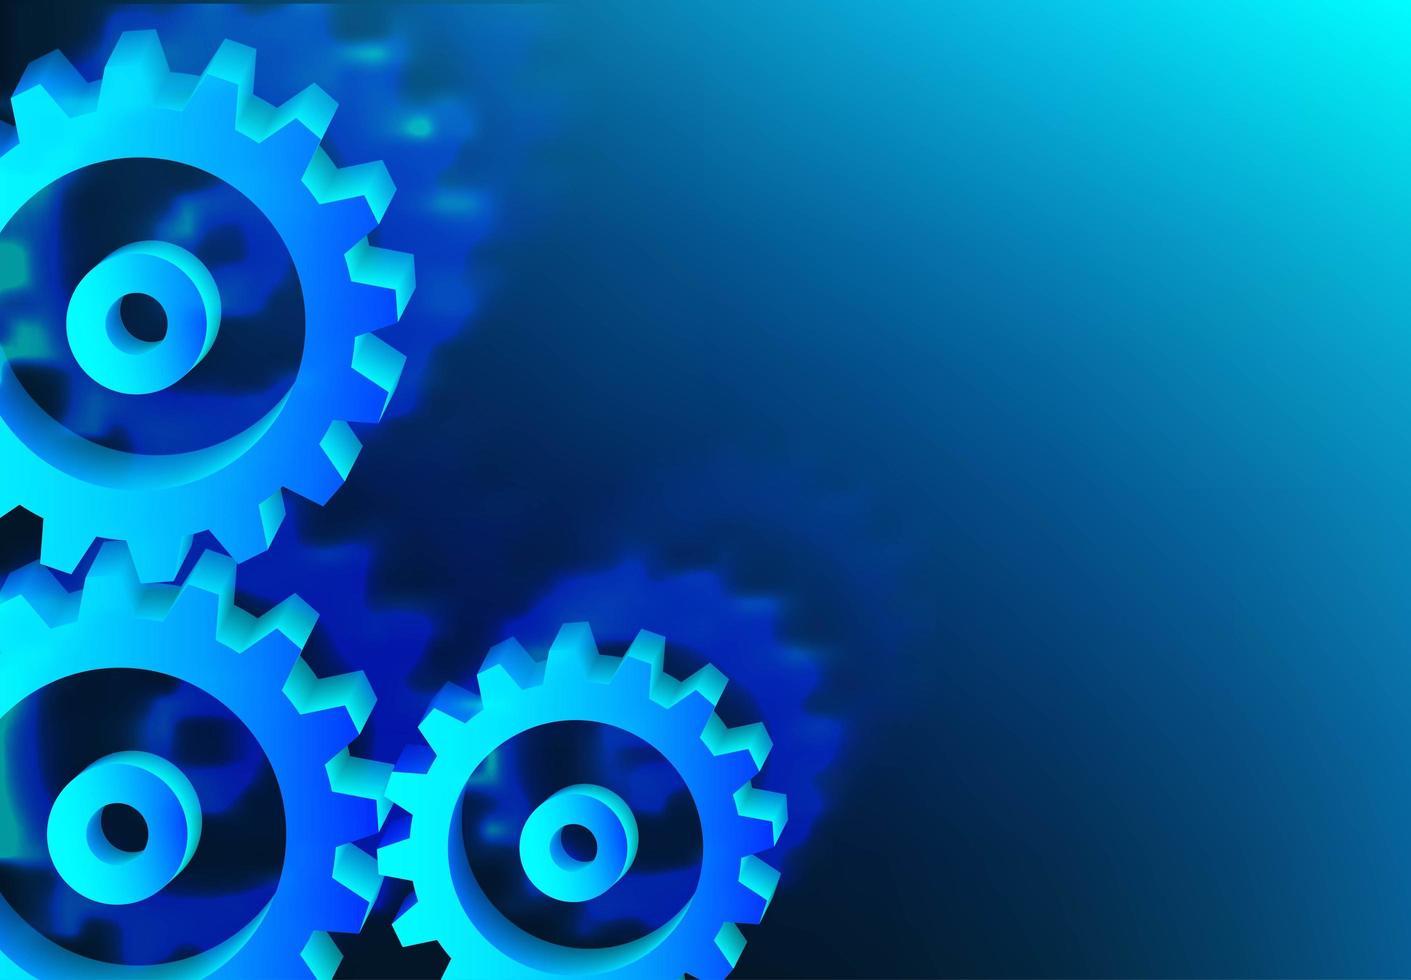 Mechanismus System Zahnräder in blau vektor